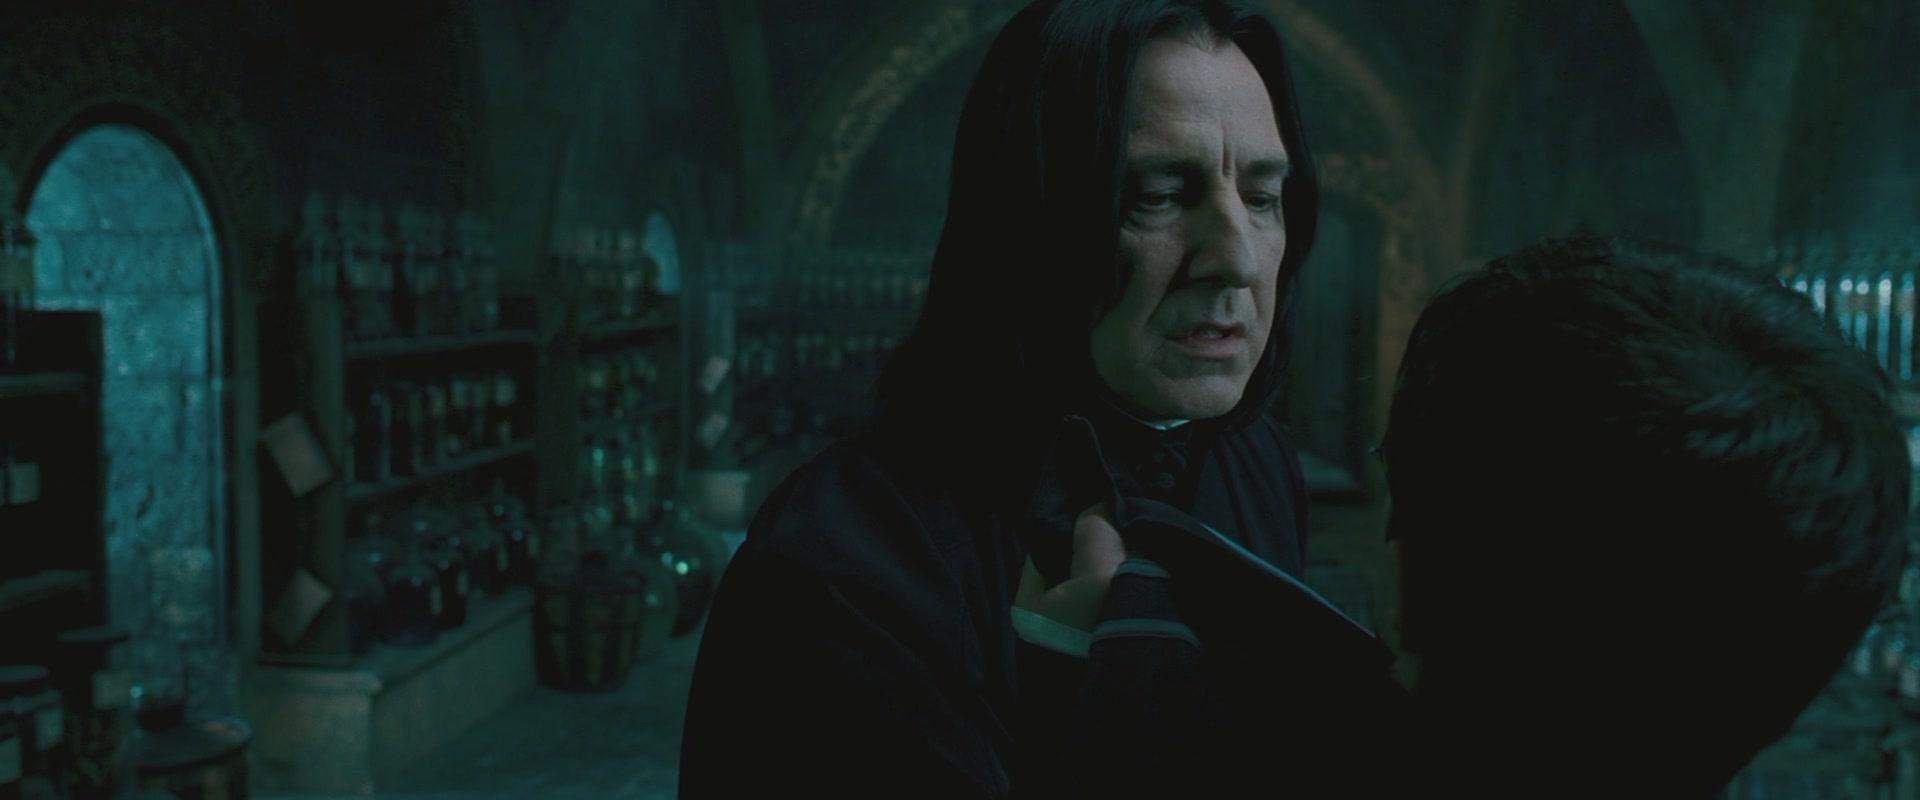 Archivop5 Severus Snape Y Harry Potterjpg Harry Potter